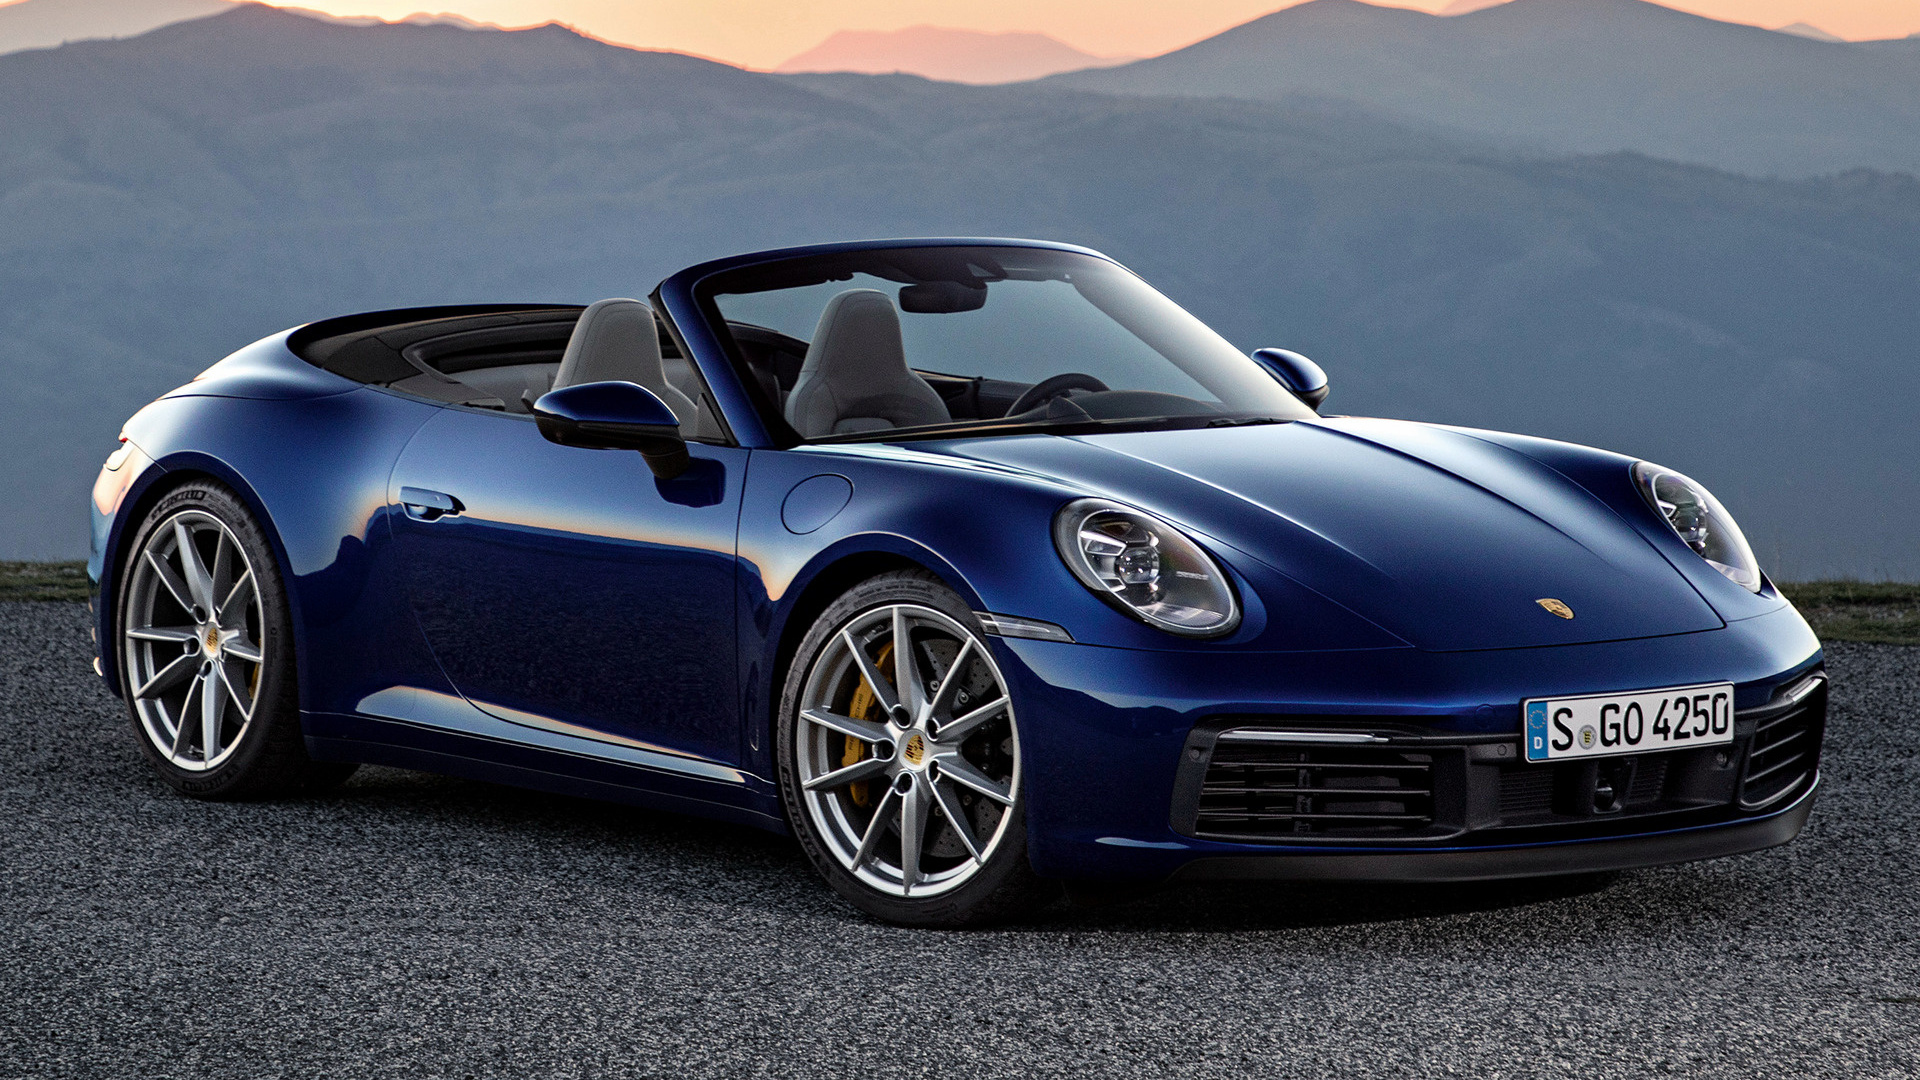 2019 porsche 911 carrera s cabriolet hintergrundbilder - Porsche 911 carrera s wallpaper ...